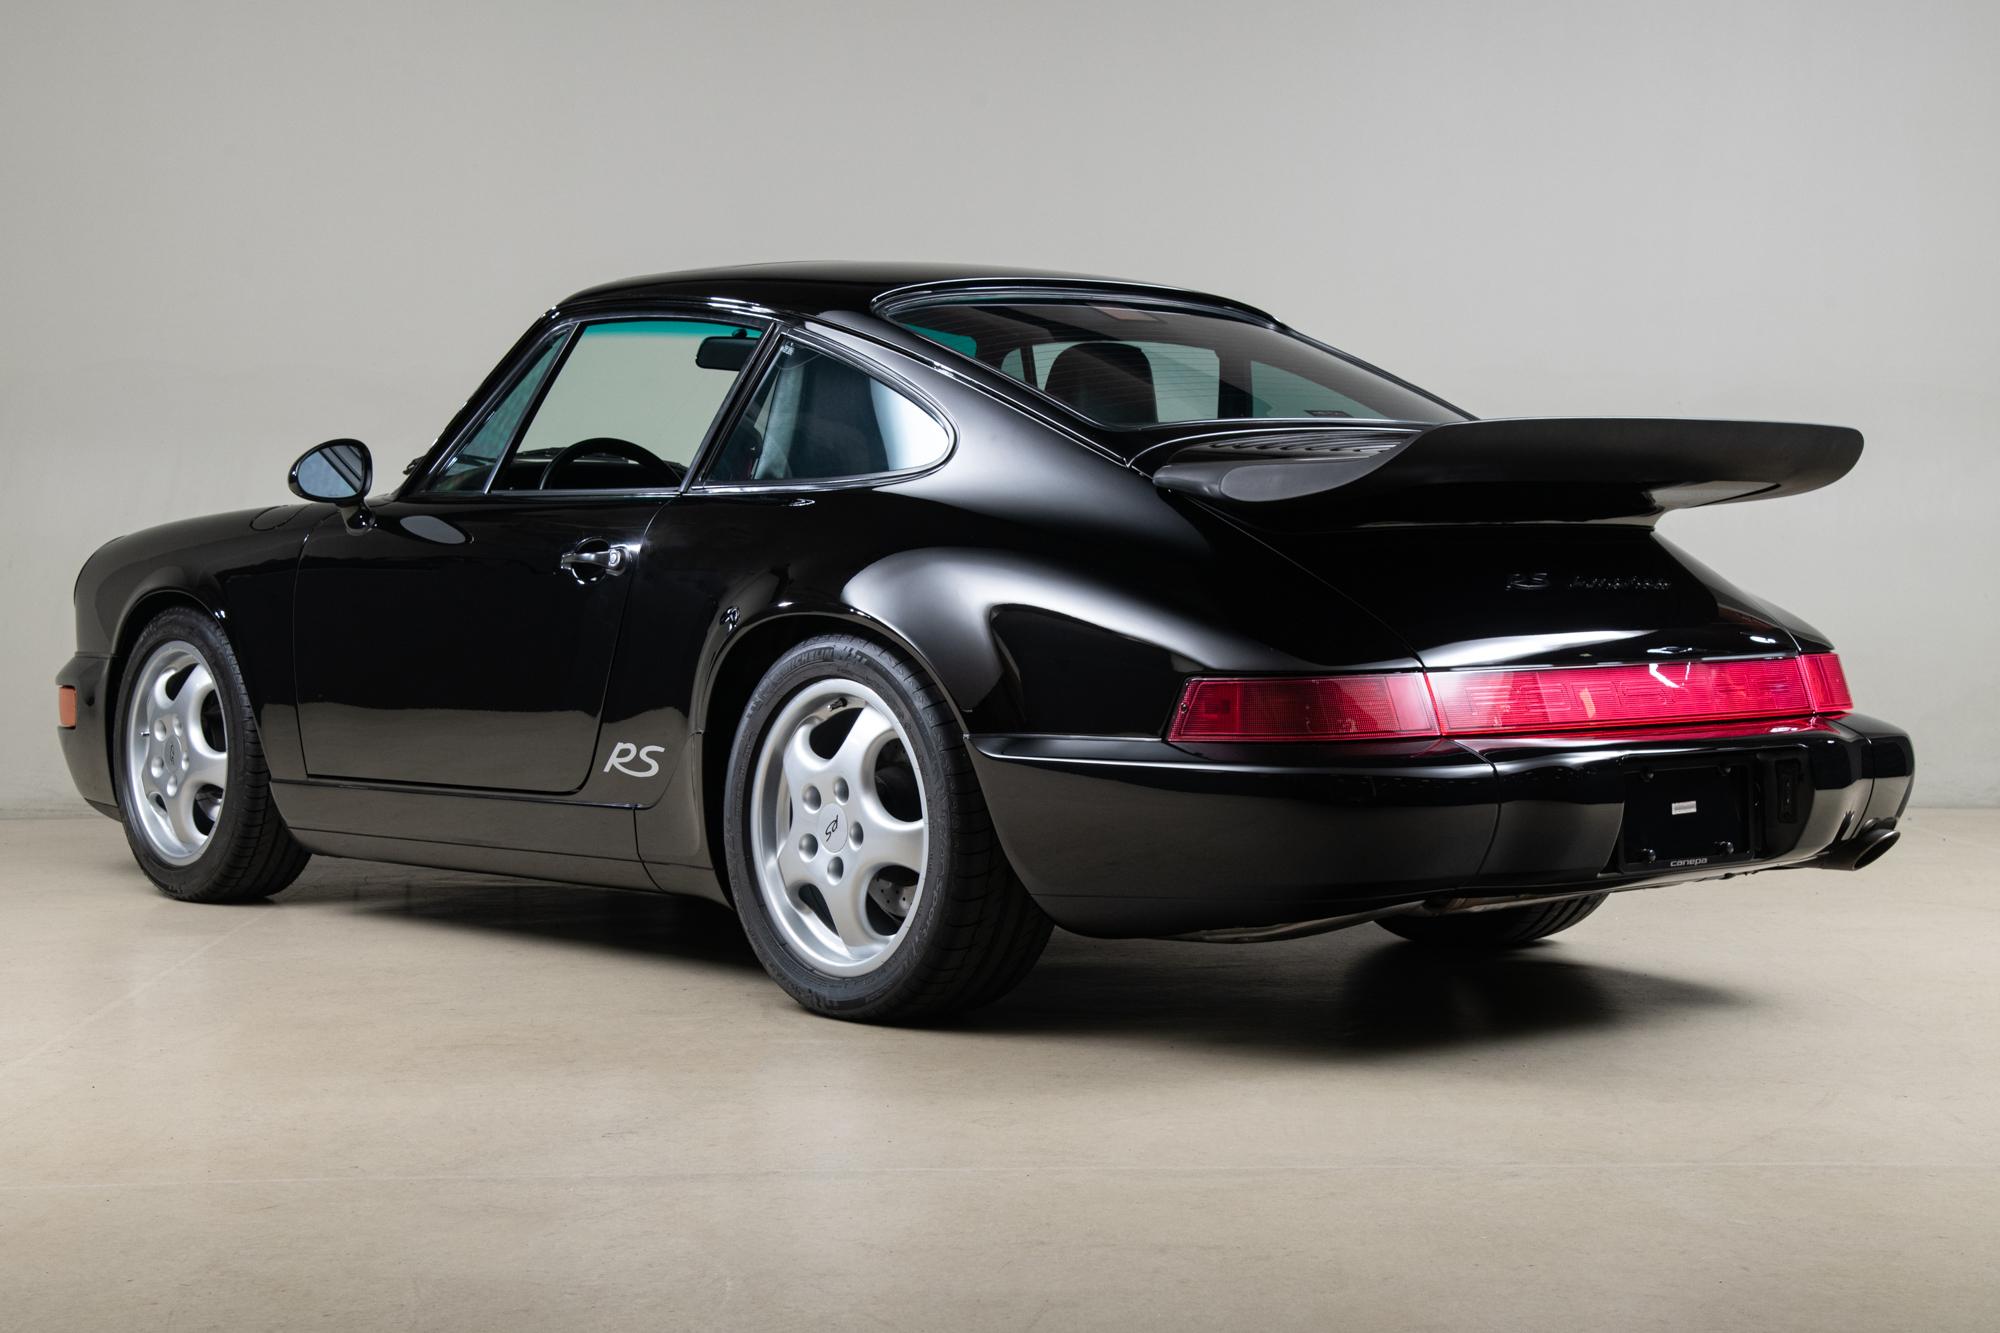 1994 Porsche 964 RS America , BLACK, VIN WP0AB2961RS419090, MILEAGE 65255